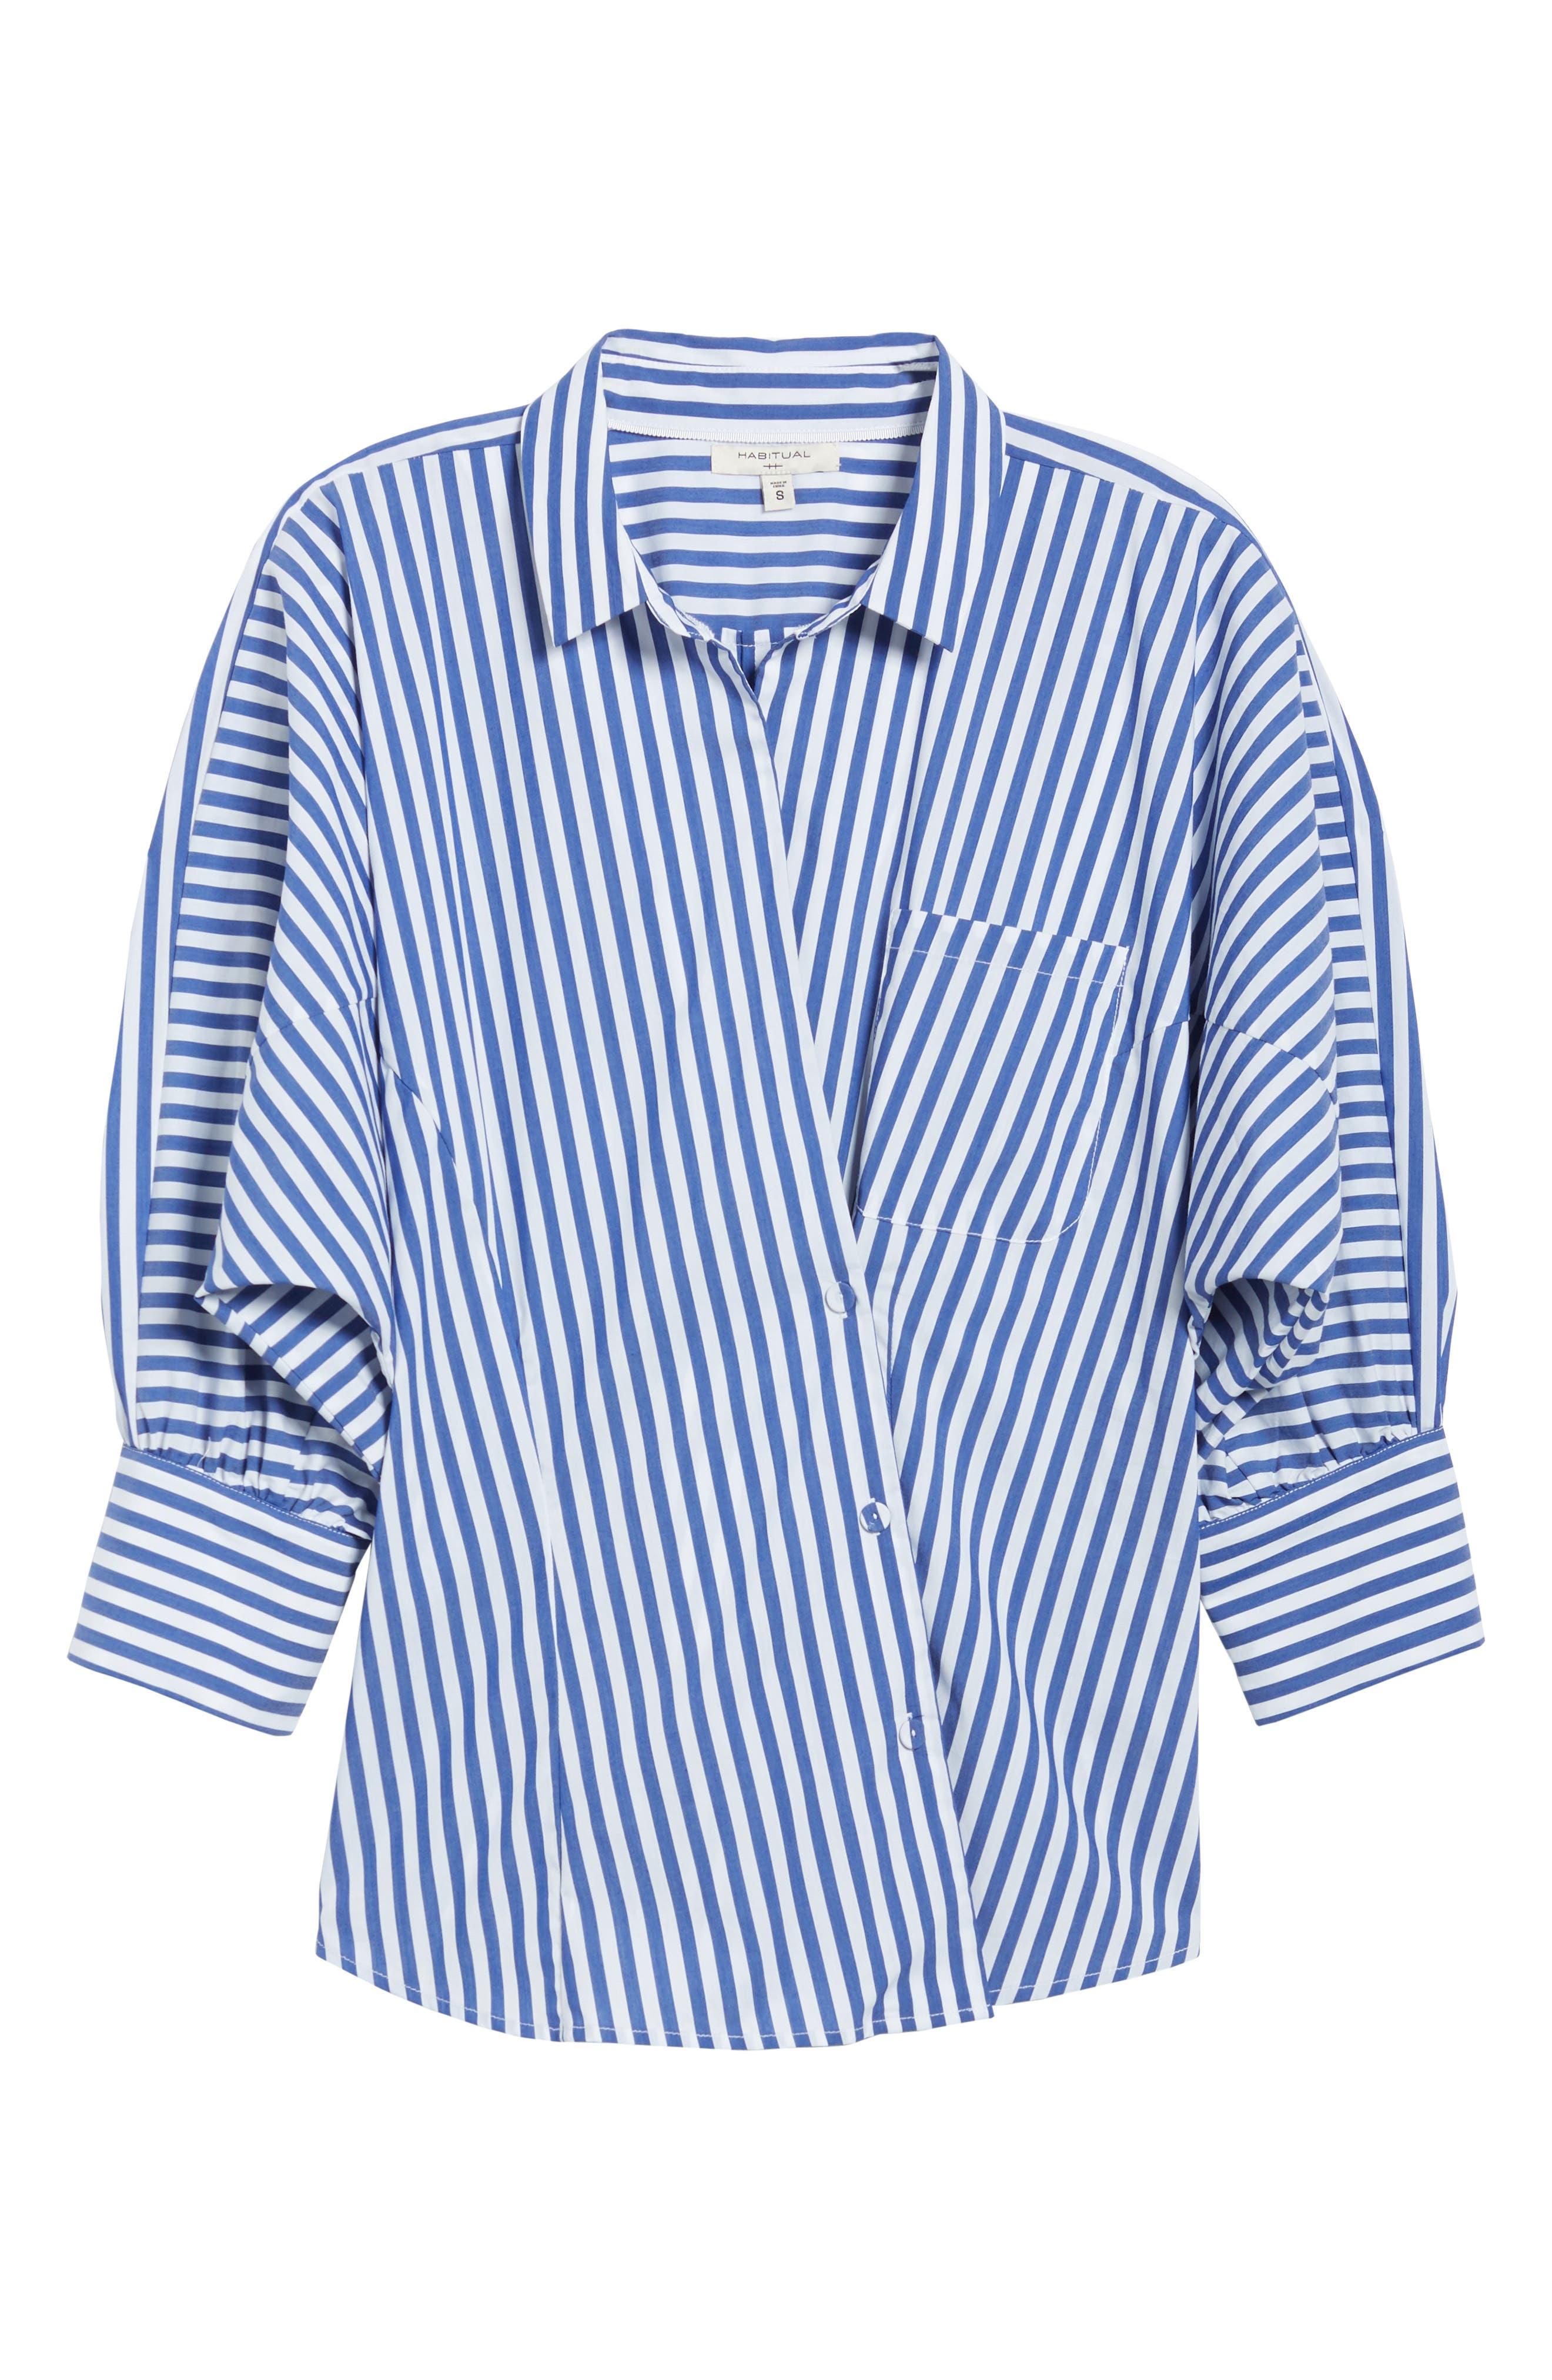 Asymmetrical Stripe Blouse,                             Alternate thumbnail 7, color,                             Abby Blue/ White